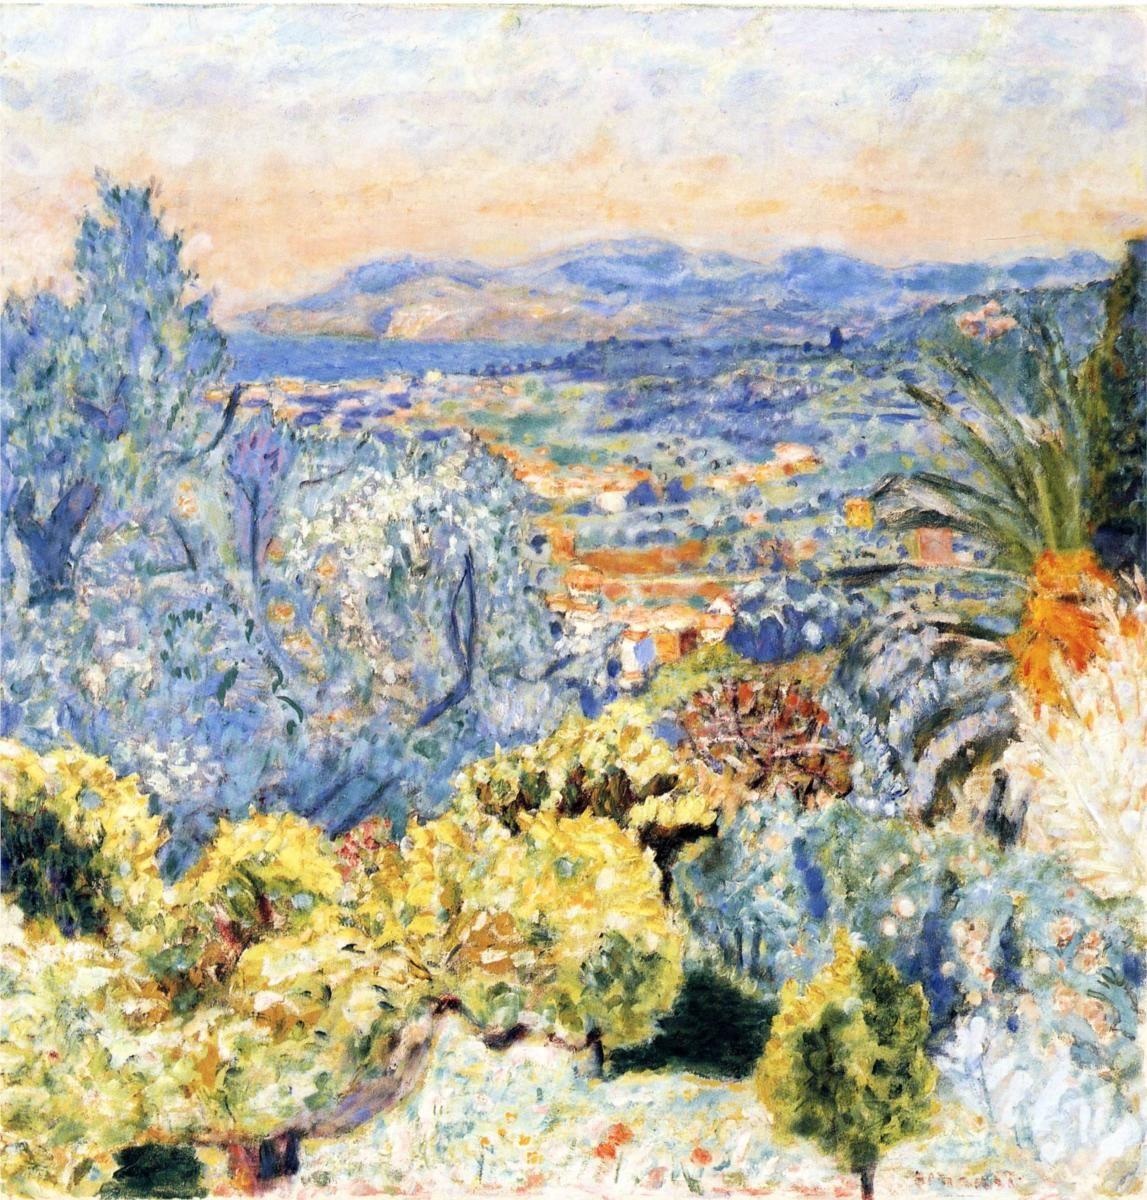 The Cote d'Azur, by Pierre Bonnard (French, 1867–1947)